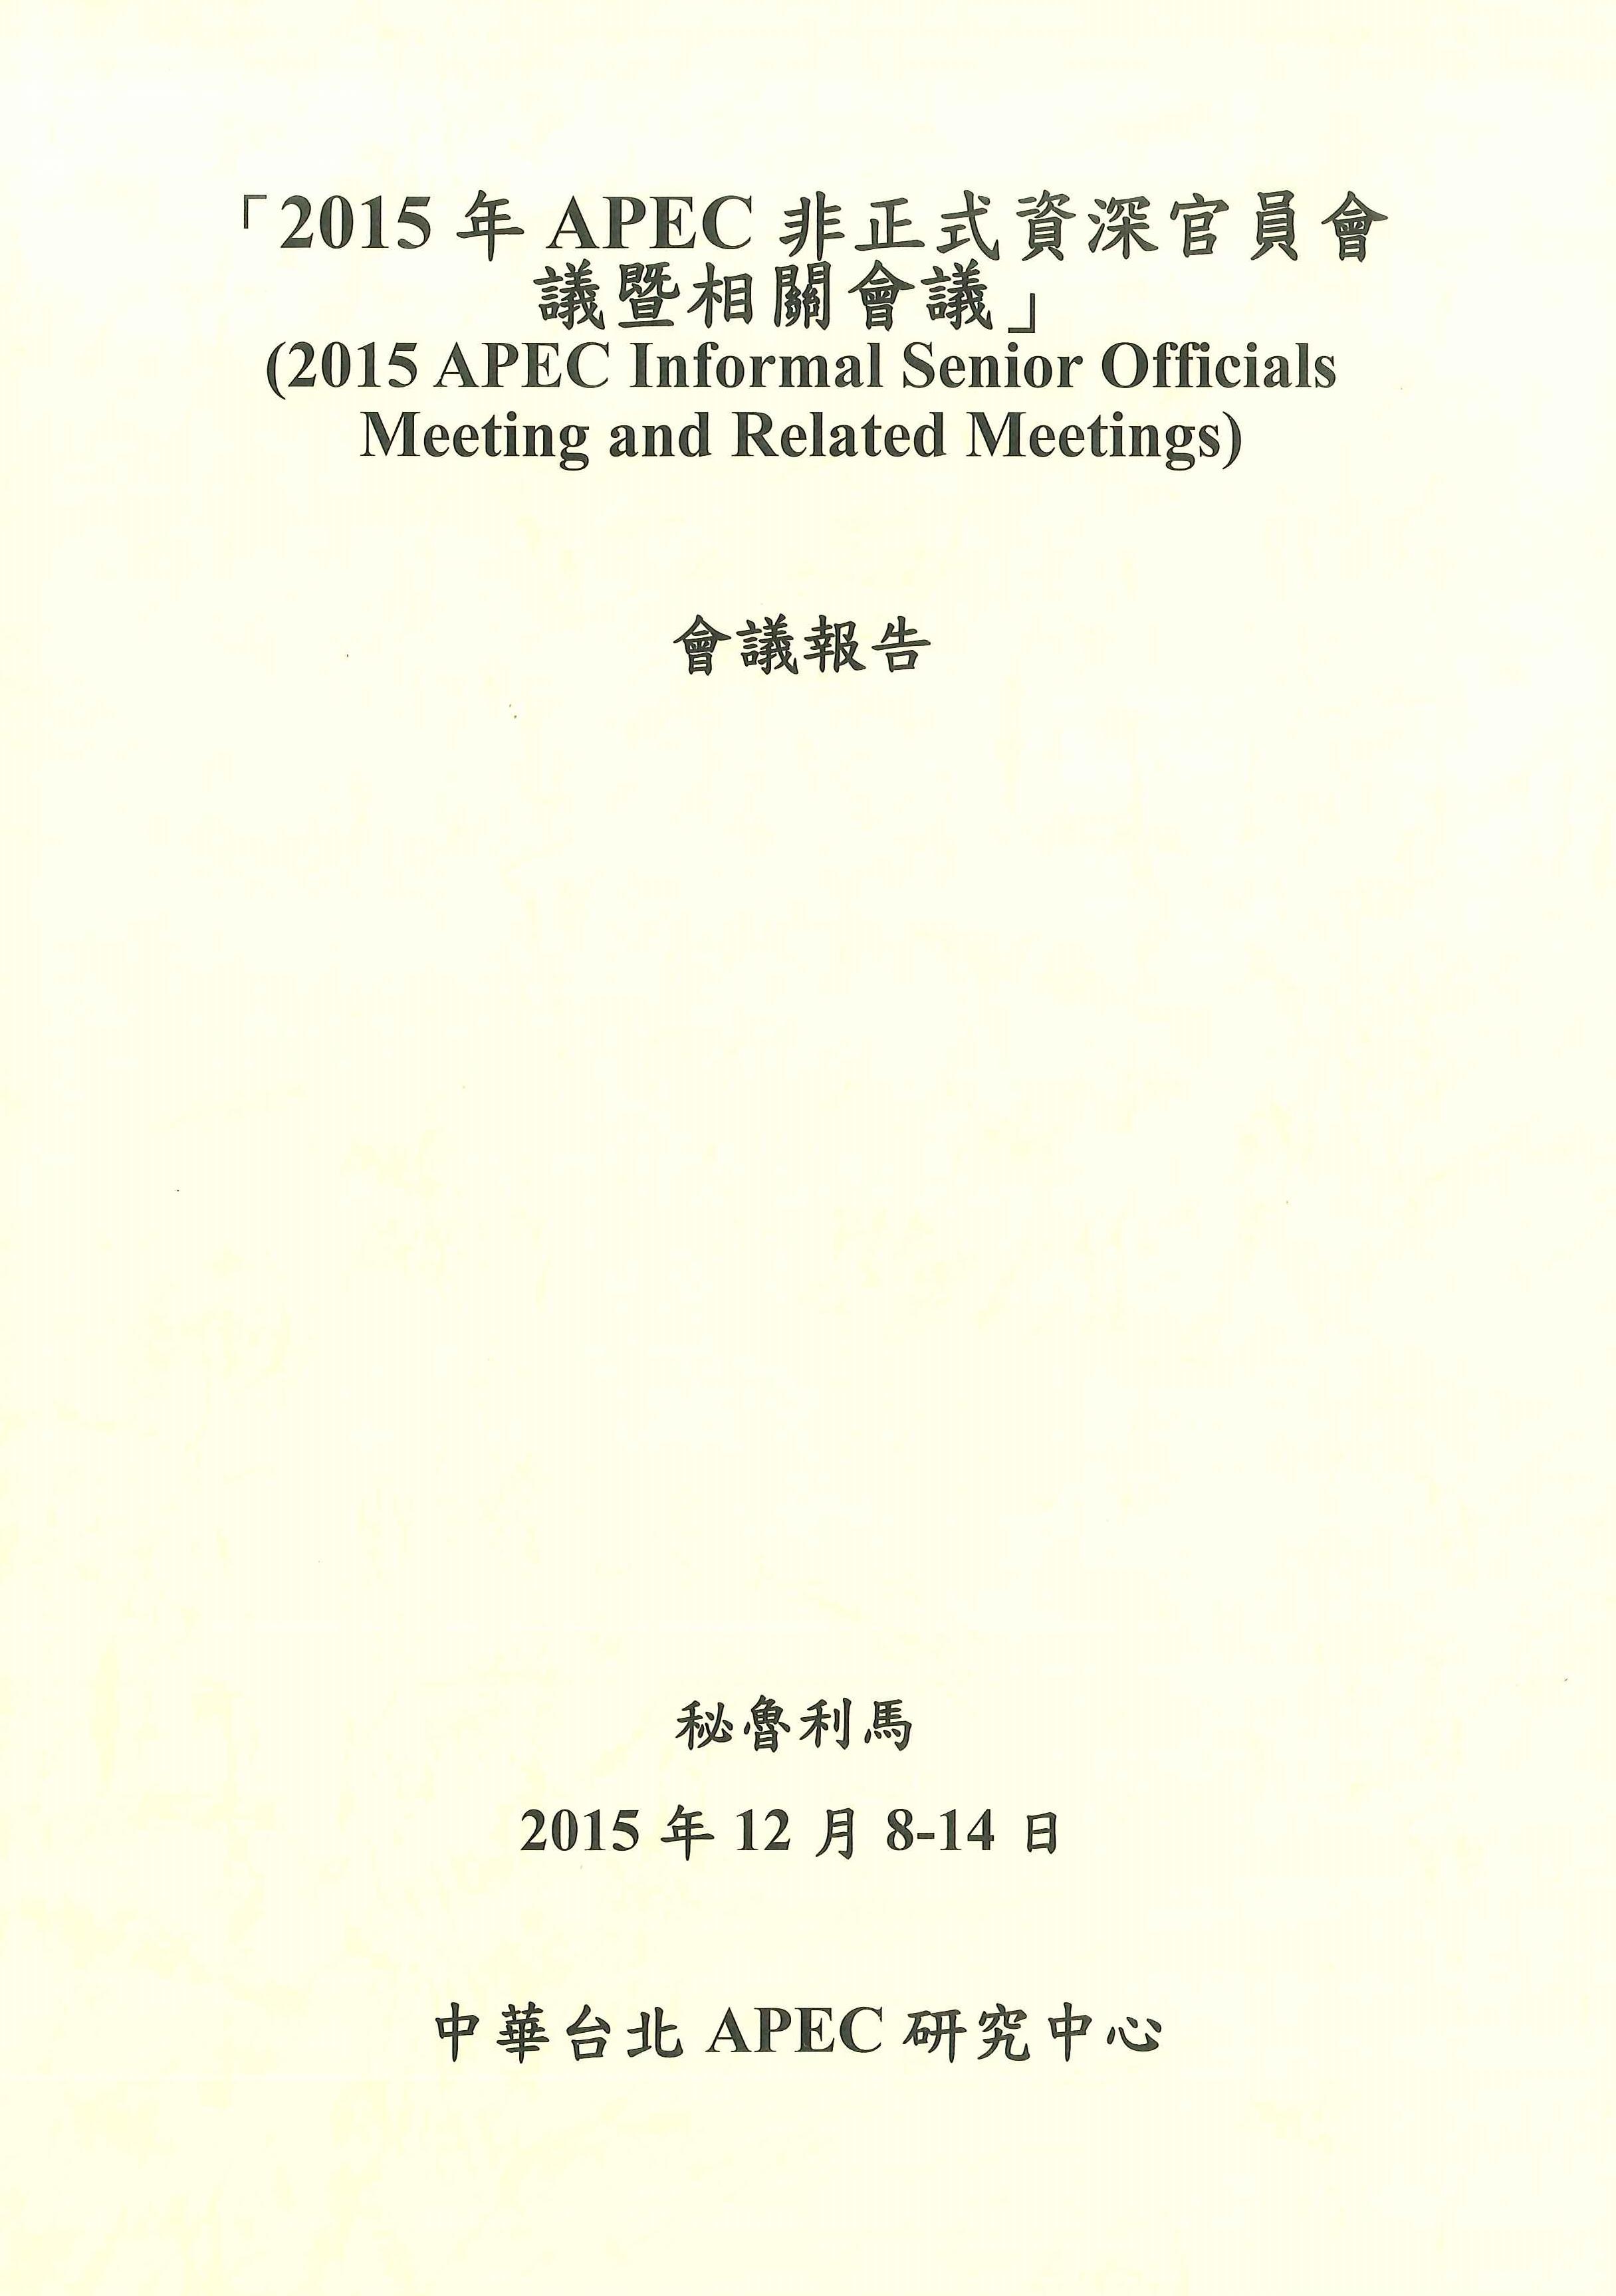 2015年APEC非正式資深官員會議暨相關會議=2015 APEC informal senior officials meeting and related meetings